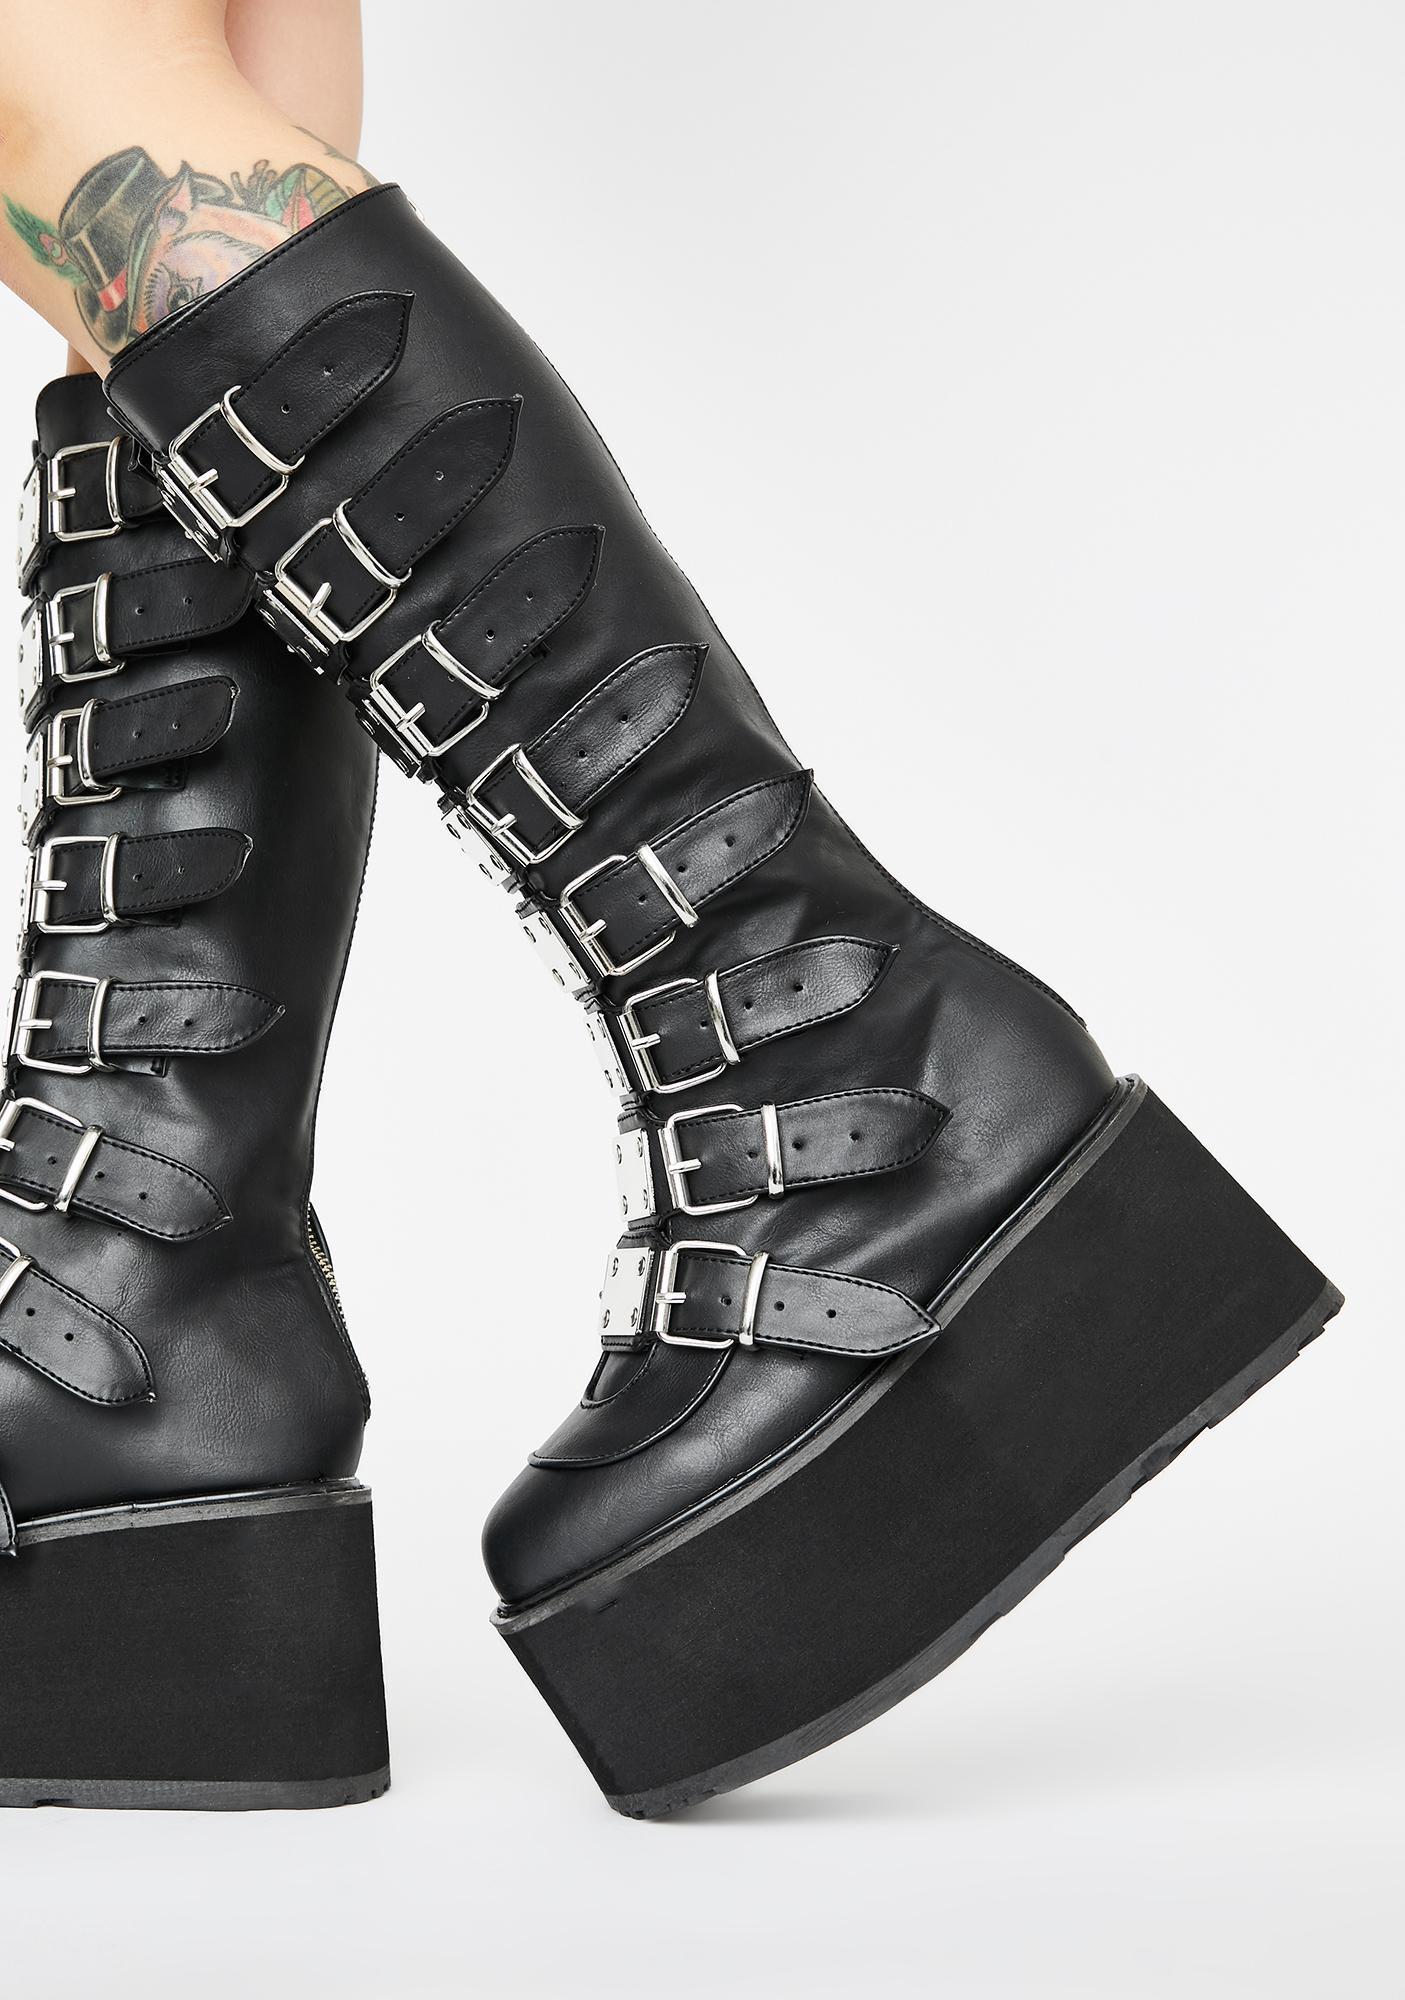 Demonia Damned Destiny Platform Boots